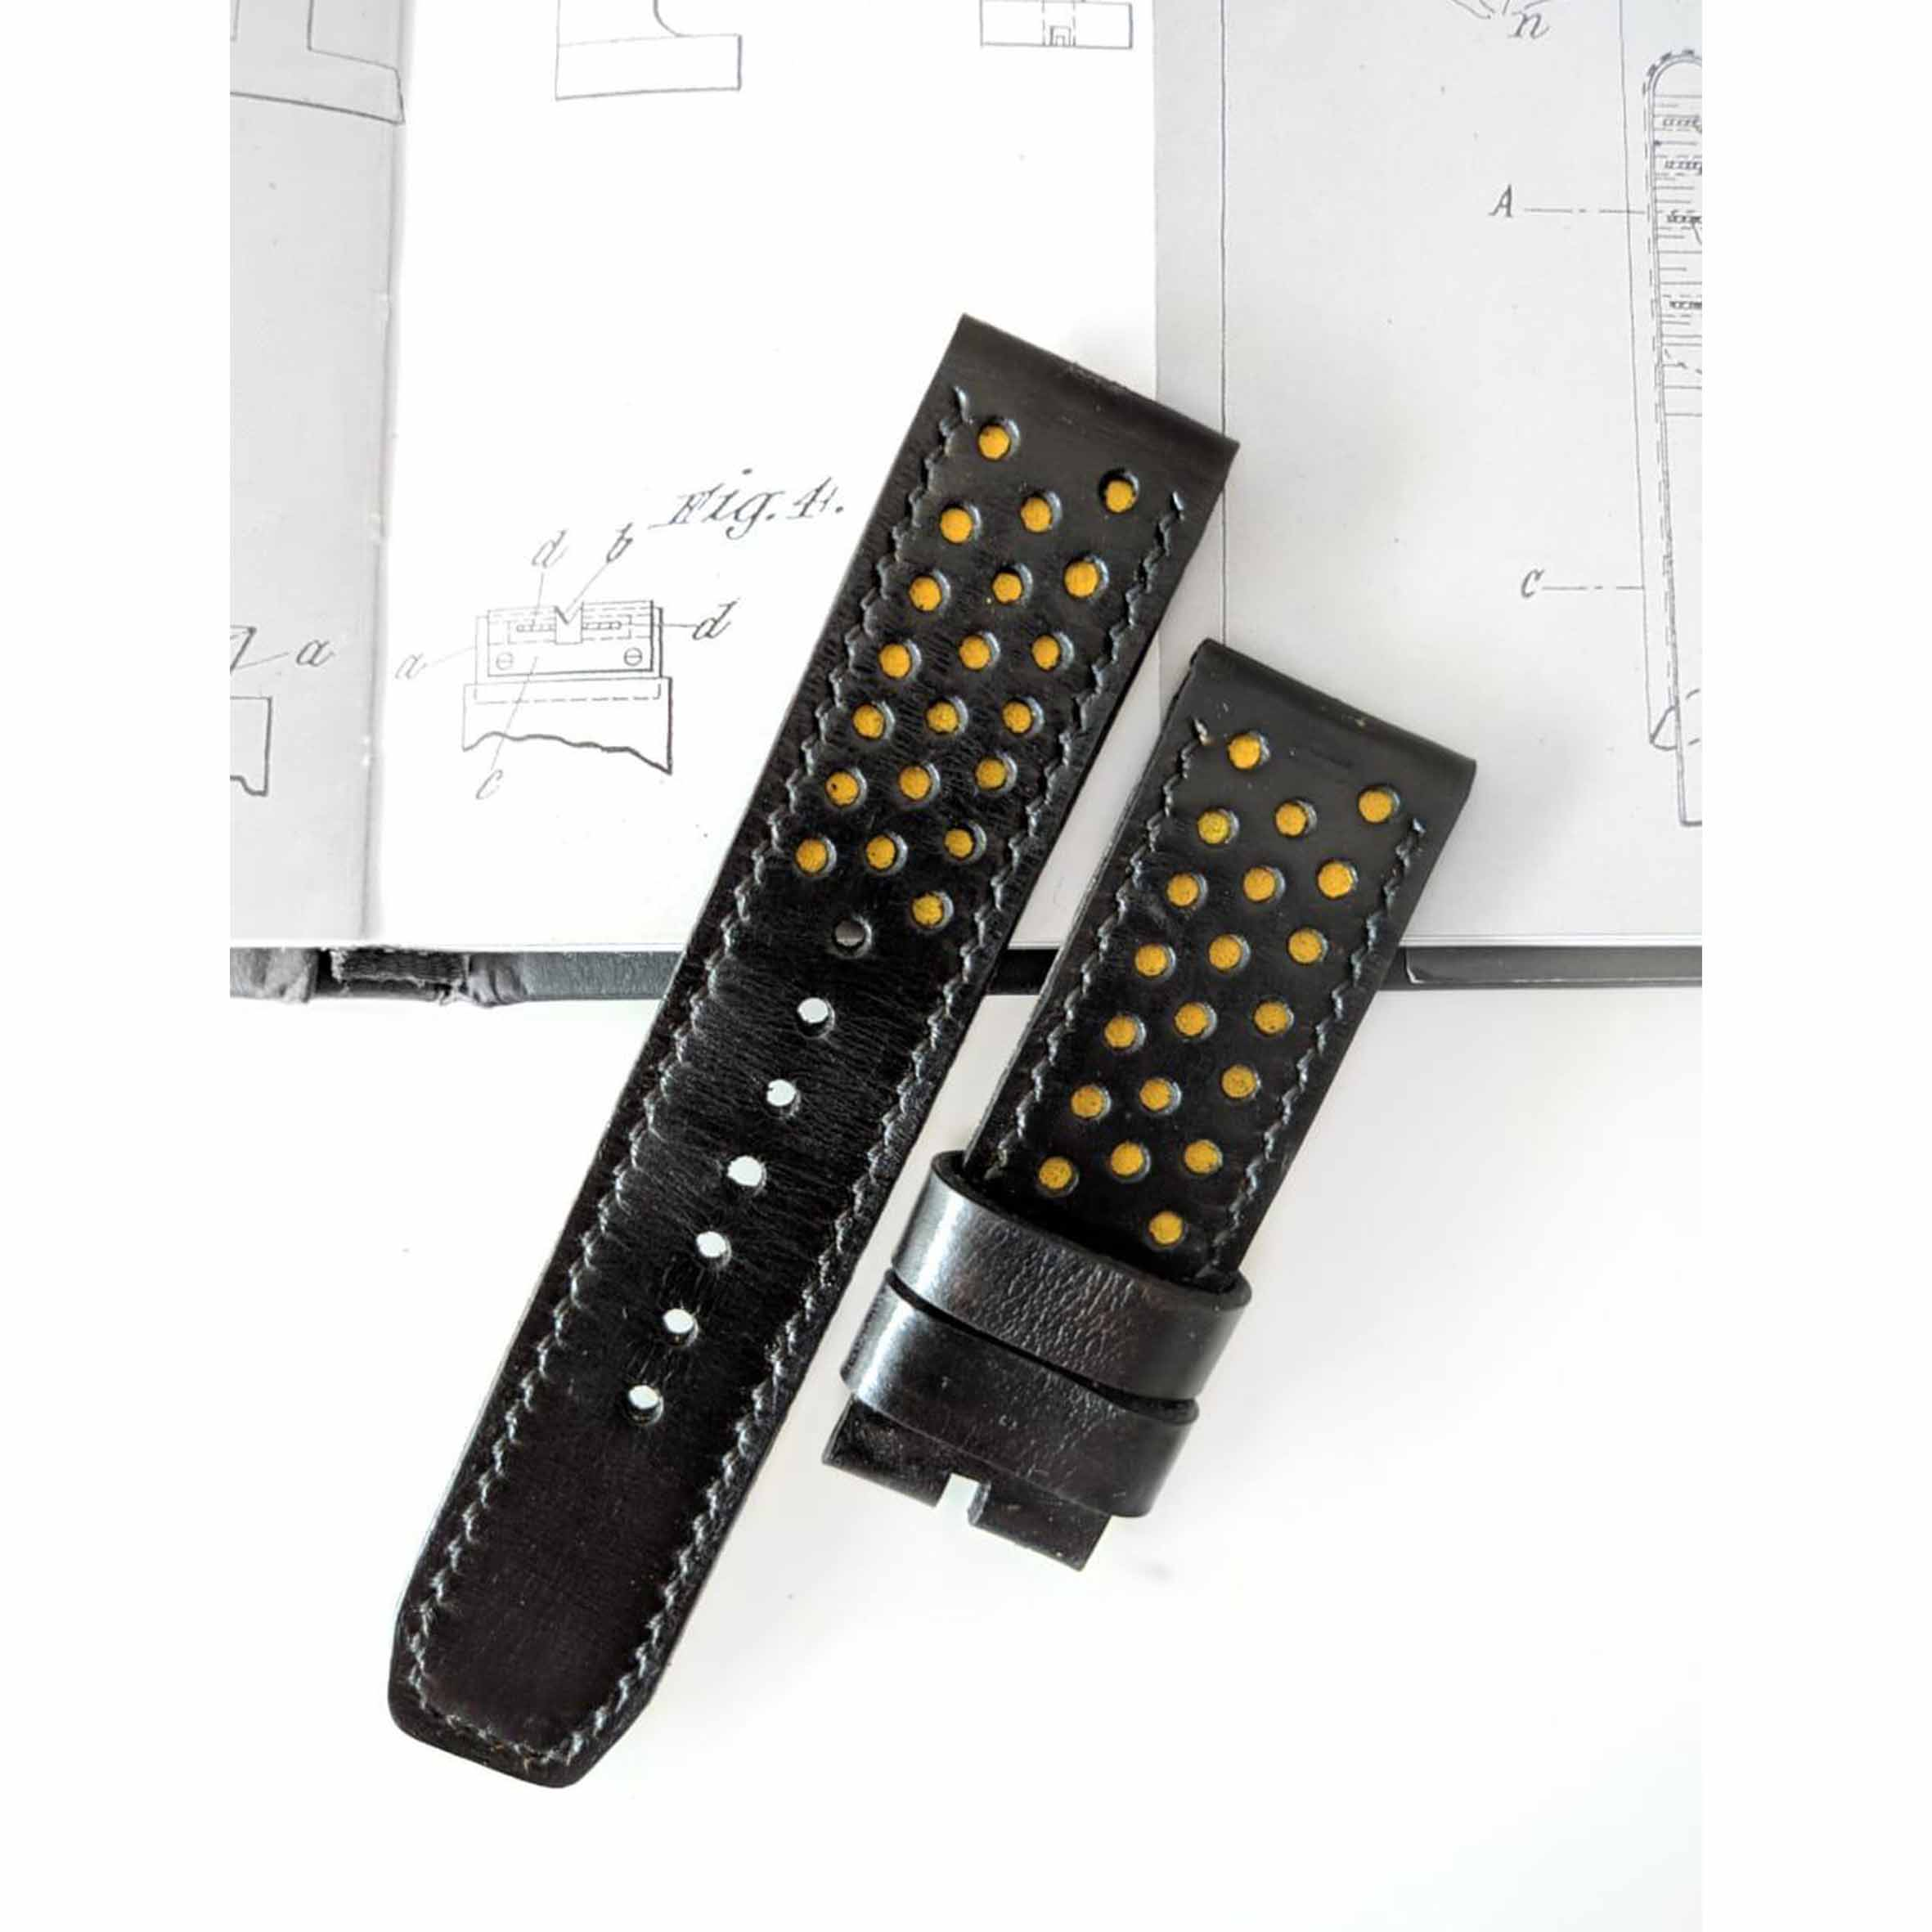 porteur-straps-black-speedy-strapsonly (1)